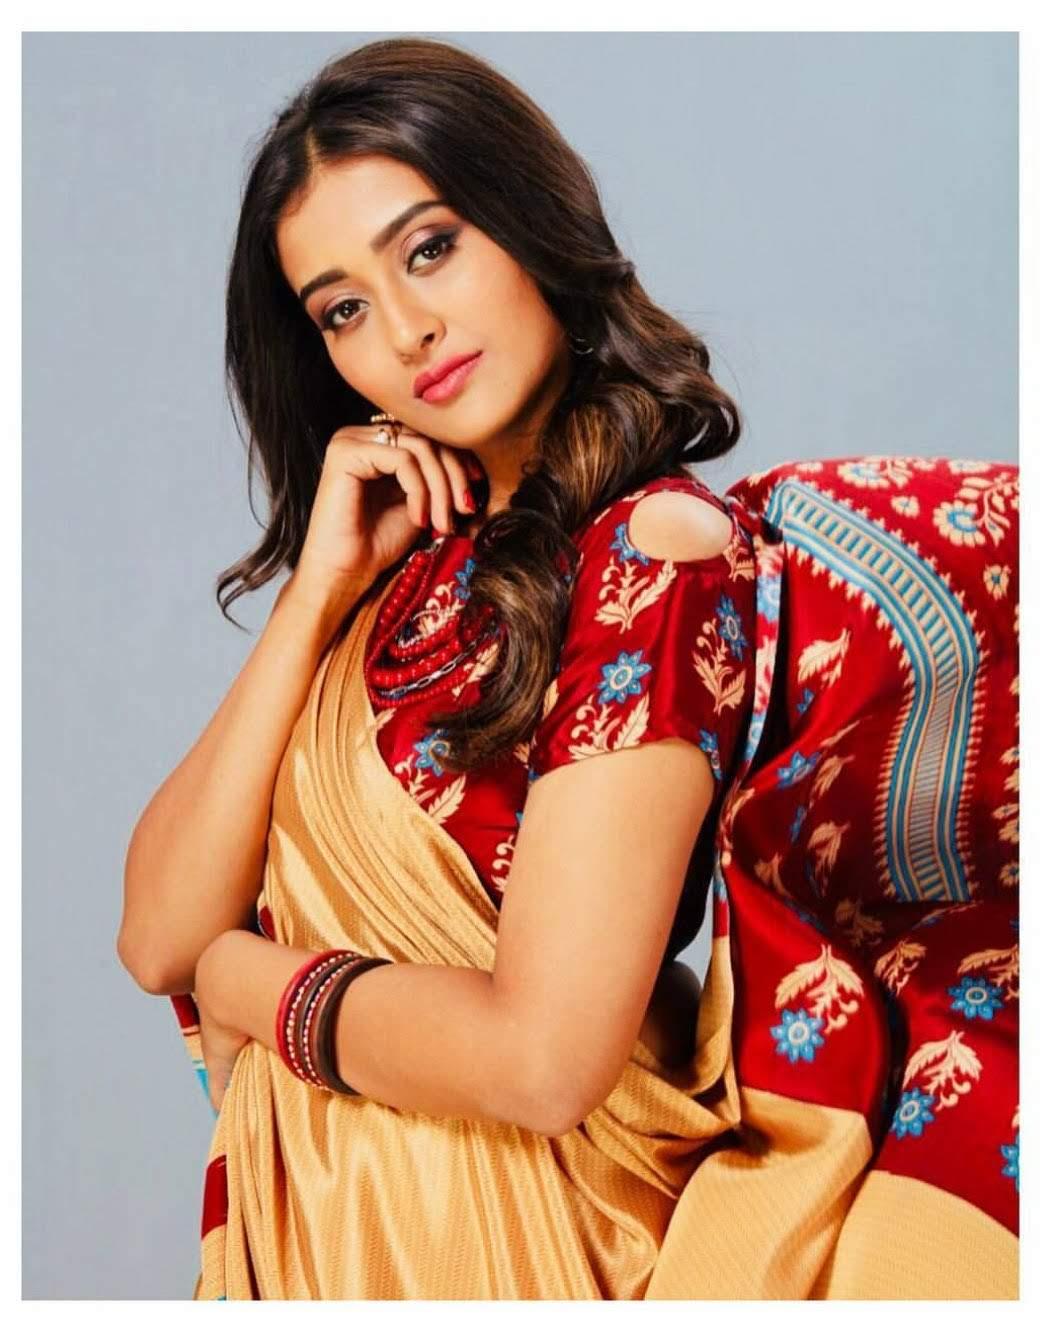 Pooja-Jhaveri-611721